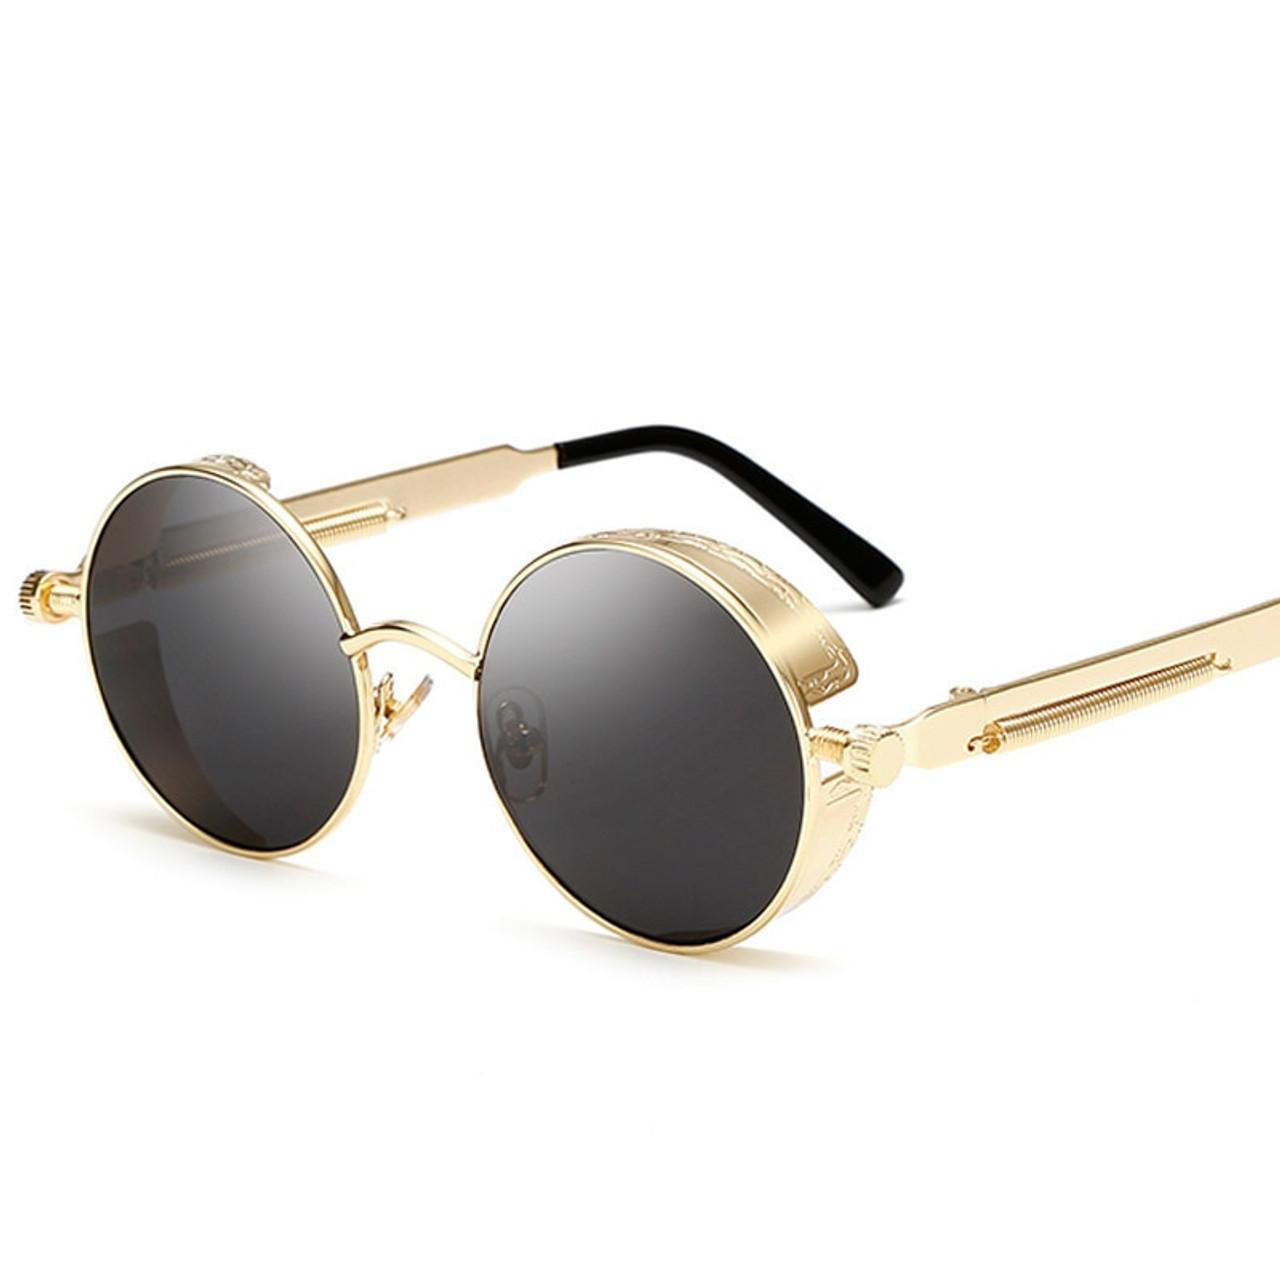 9aacf357ca657 Retro Round Metal Steampunk Sunglasses Men Women Fashion Glasses Brand  Designer Vintage Sunglasses High Quality UV400 ...